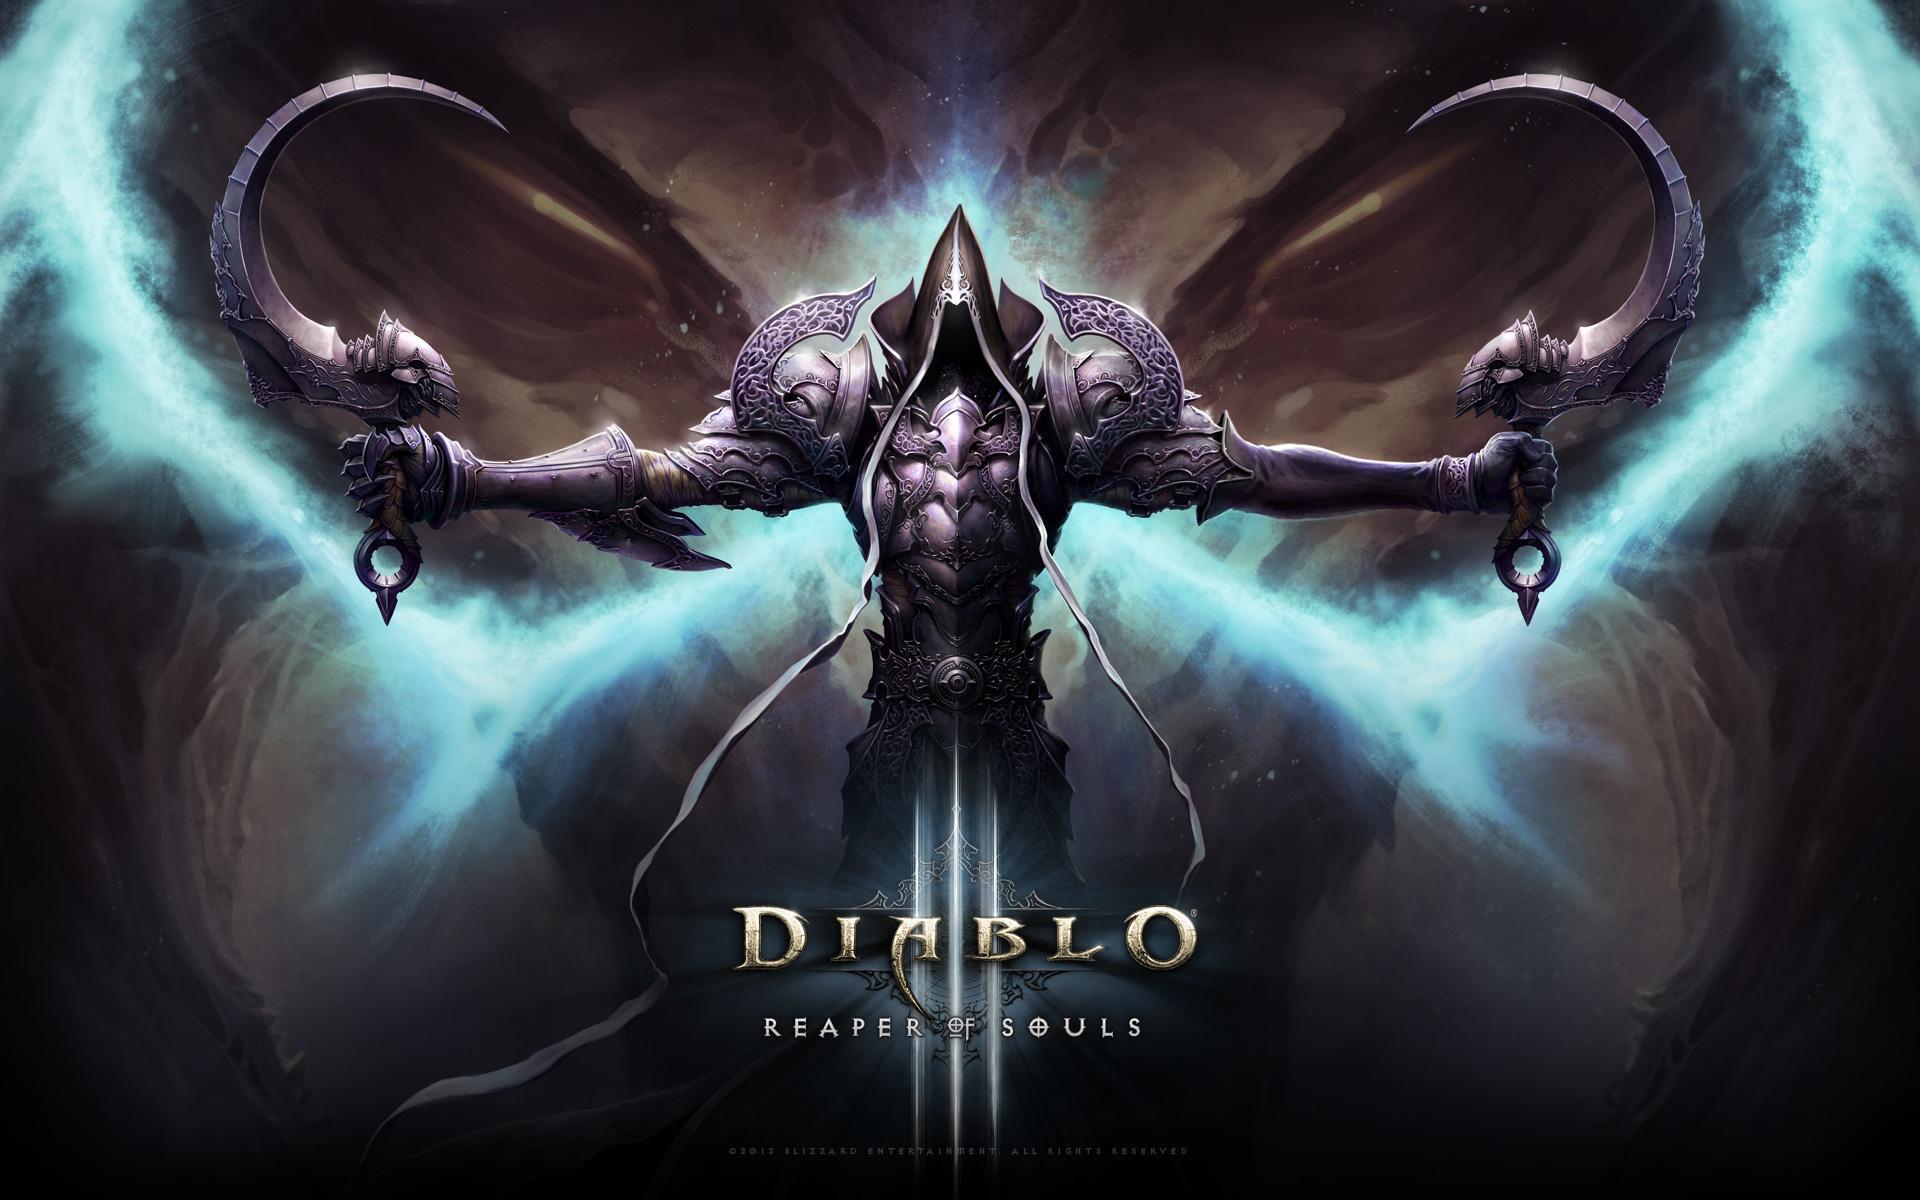 Download Diablo 3 Wallpaper Hd Backgrounds Download Itlcat